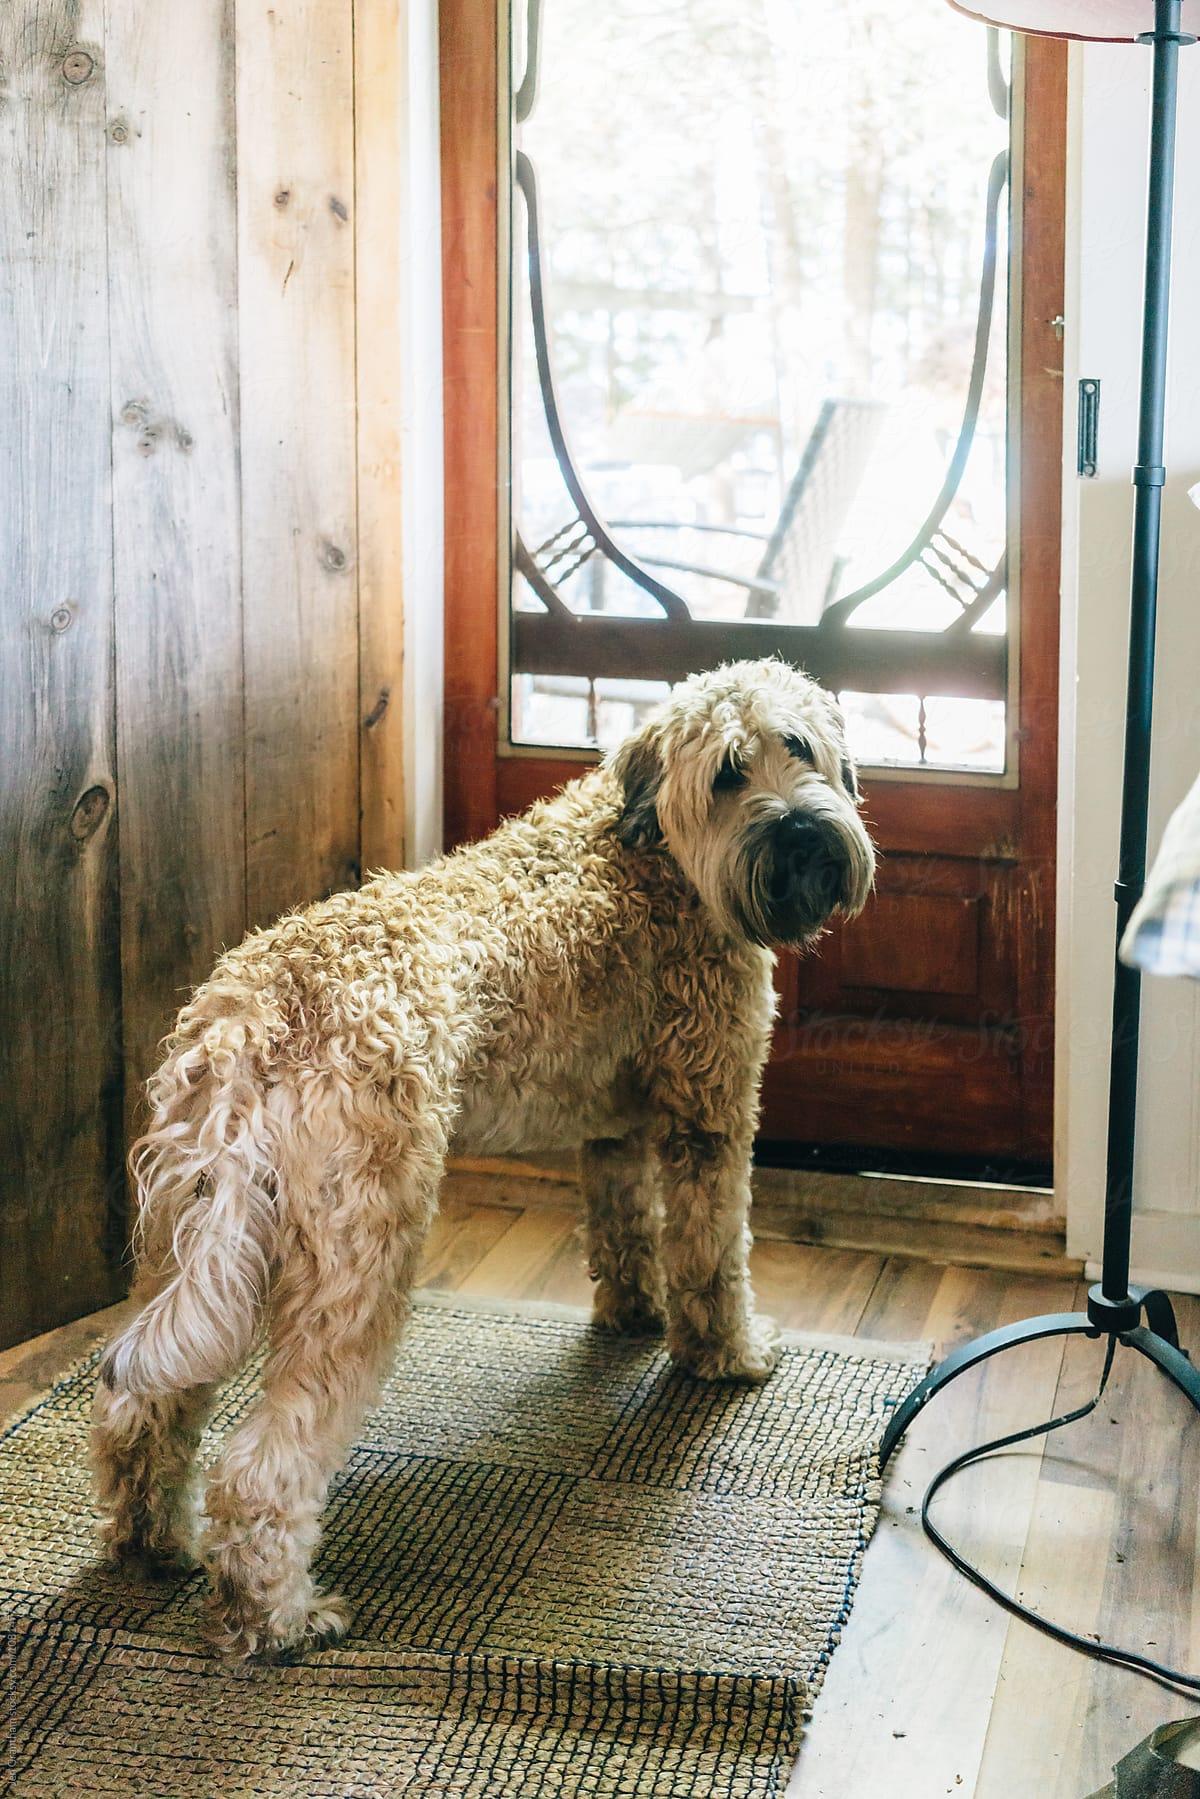 Wheaten Terrier Haircut Styles : wheaten, terrier, haircut, styles, Coated, Wheaten, Terrier, Outside, Cottag, Grantham, Stocksy, United